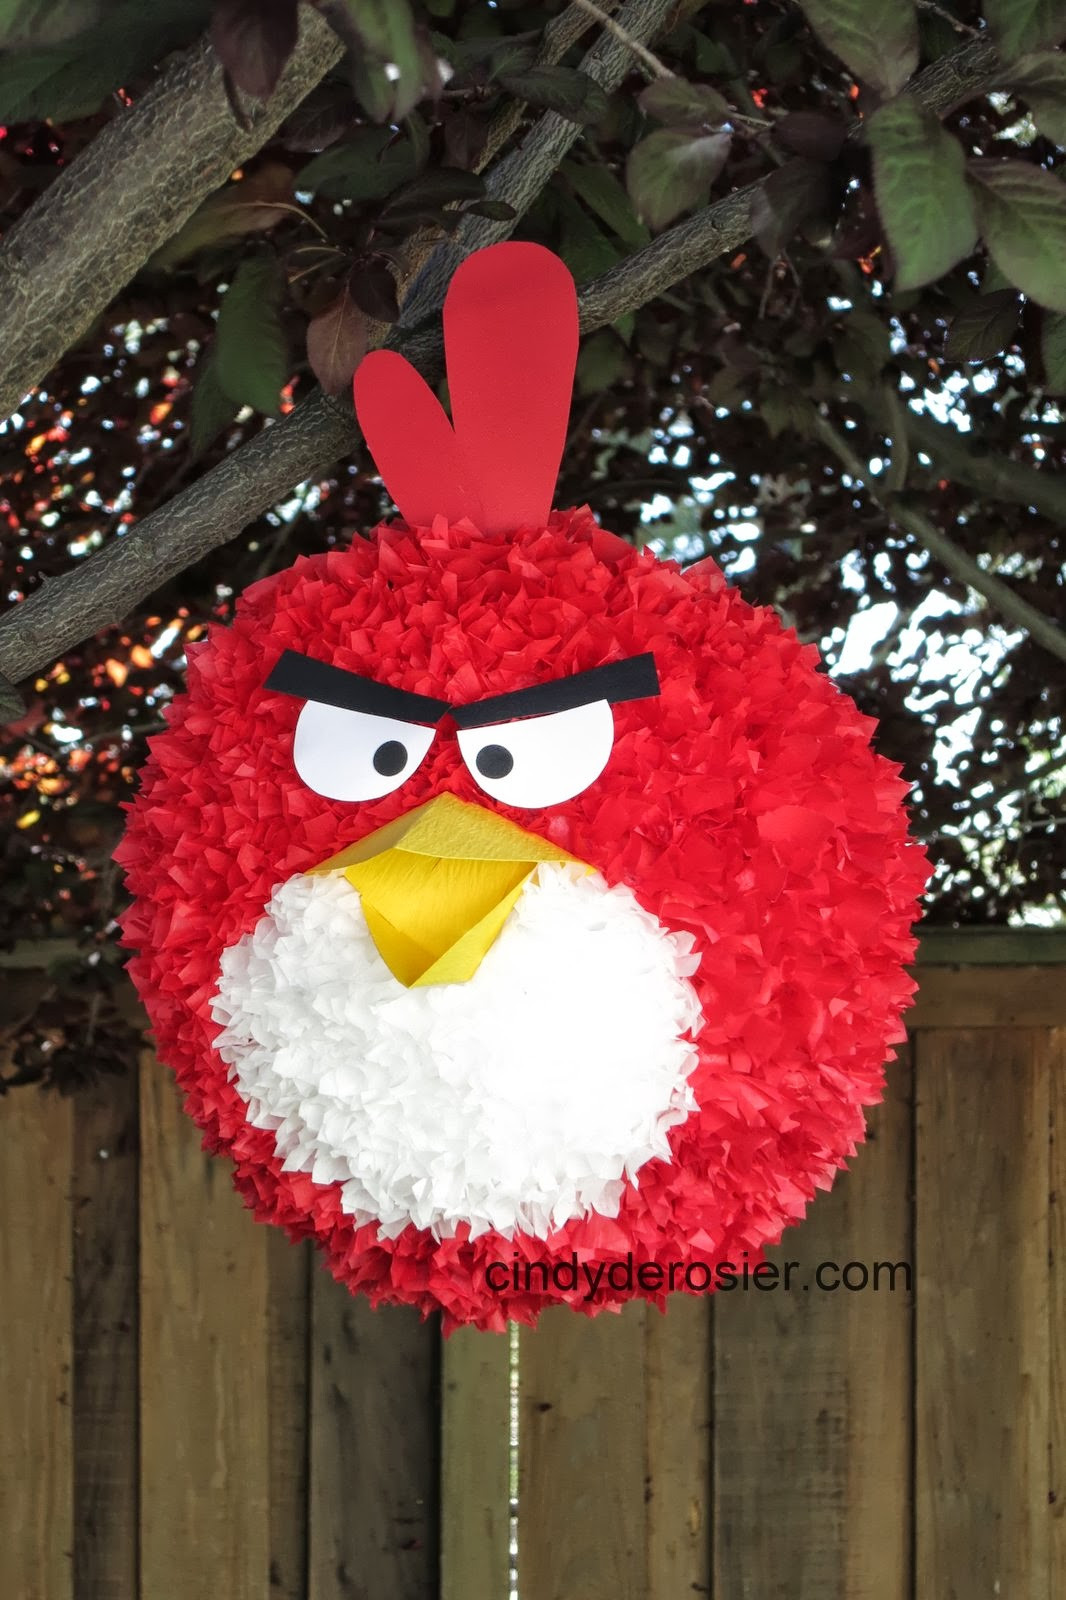 Pinata Diy  Cindy deRosier My Creative Life DIY Angry Bird Piñata